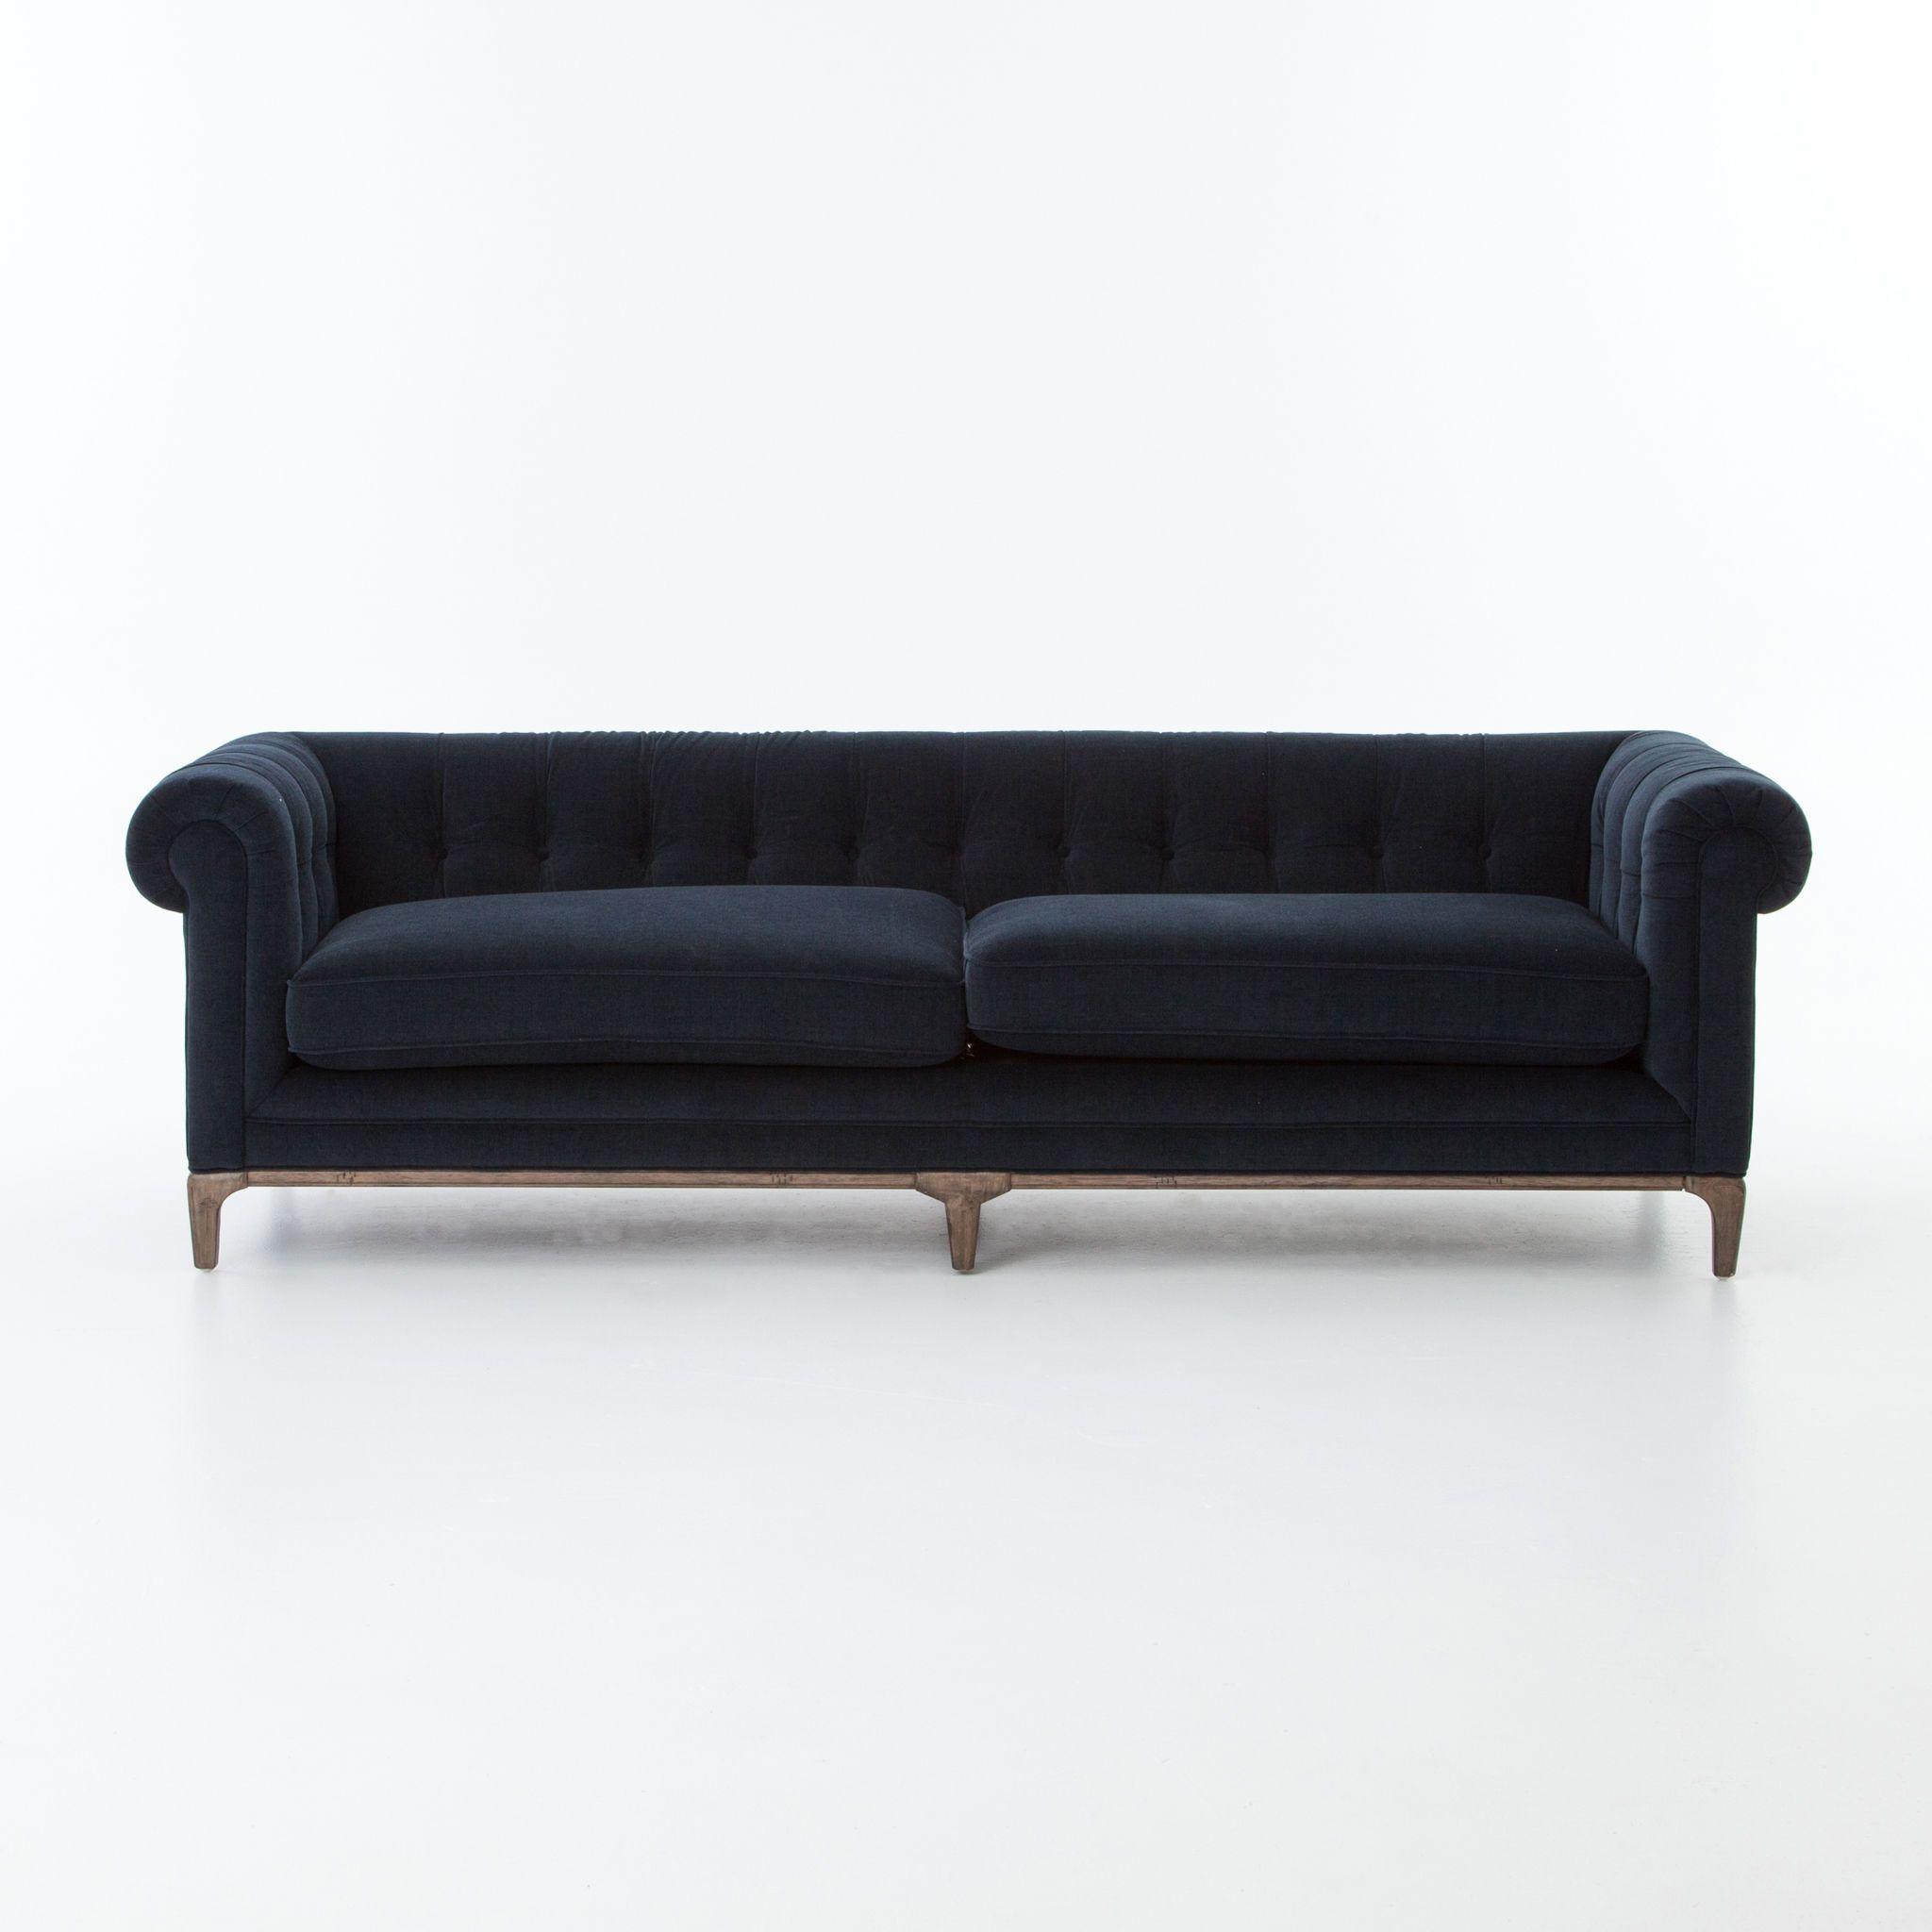 Four Hands Living Room Griffon Sofa-Plush Navy CKEN-F8A3-404 | RSRCS ...